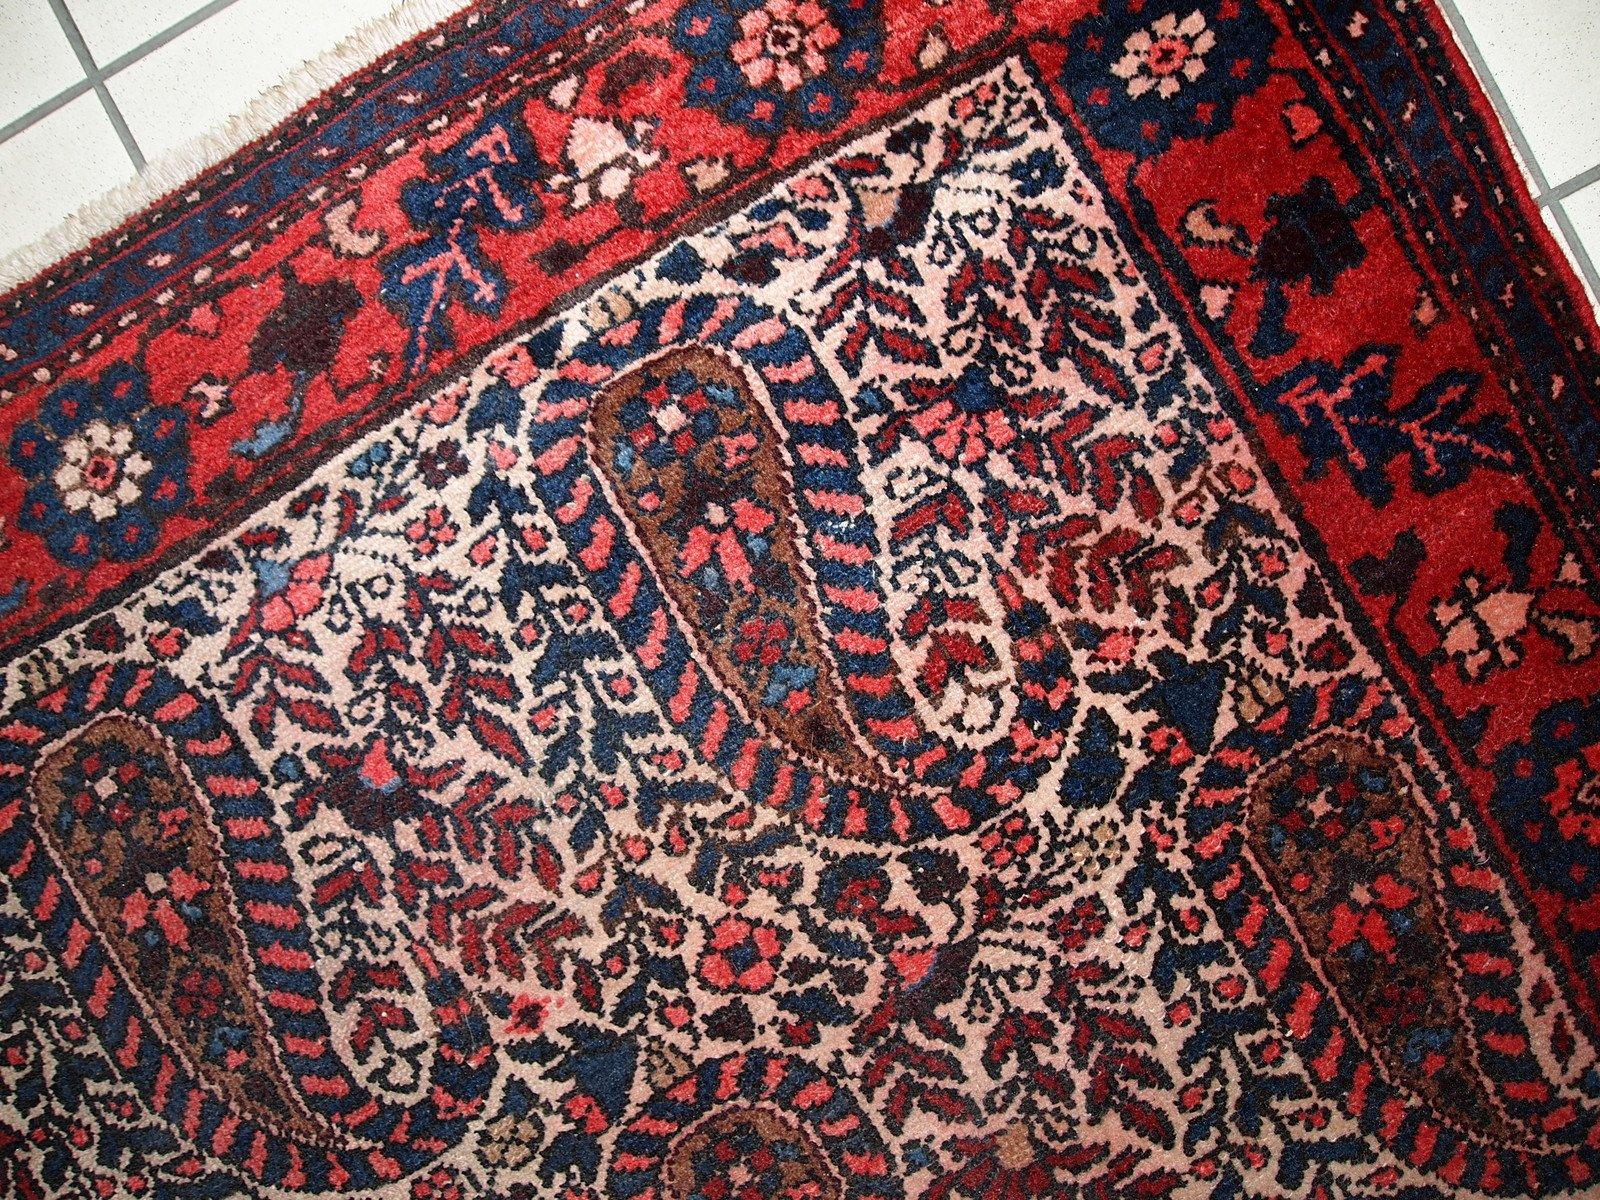 Berühmt Tapis Malayer Vintage Fait Main, Iran, 1950s en vente sur Pamono YM99